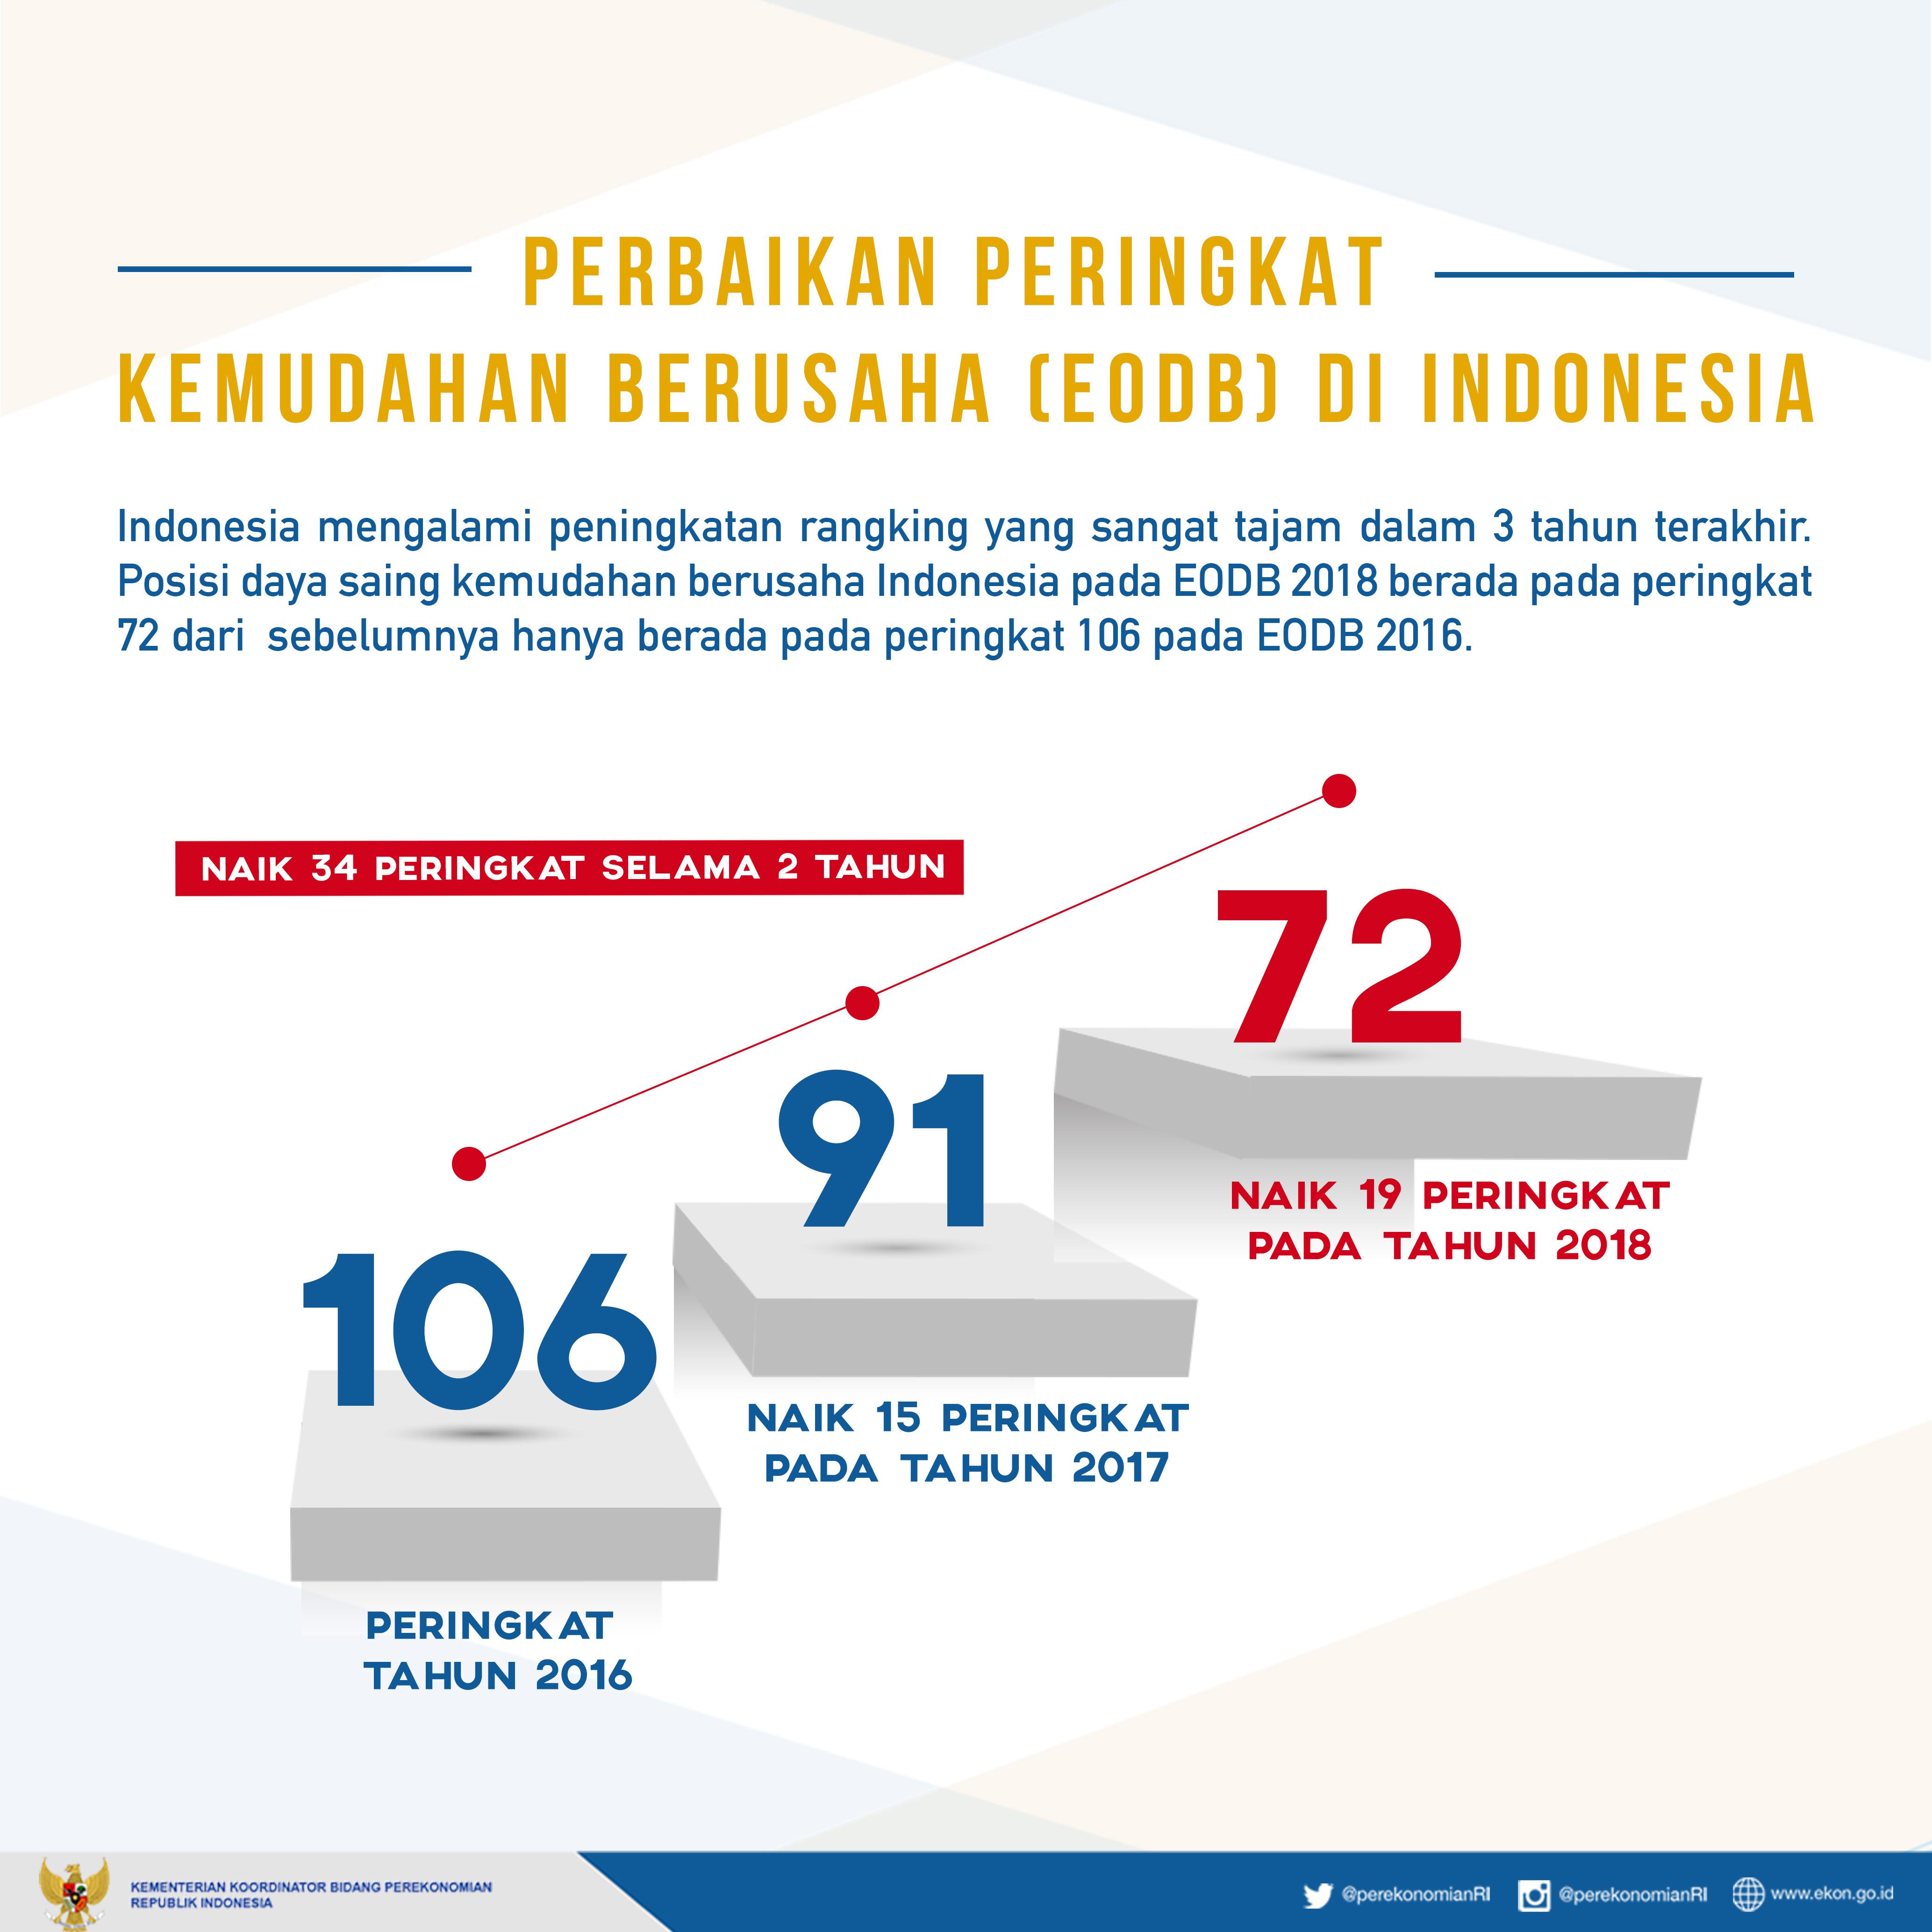 Capaian ini melanjutkan tren percepatan peningkatan peringkat dalam dua tahun terakhir Seperti diketahui pada EODB 2017 posisi Indonesia naik 15 peringkat